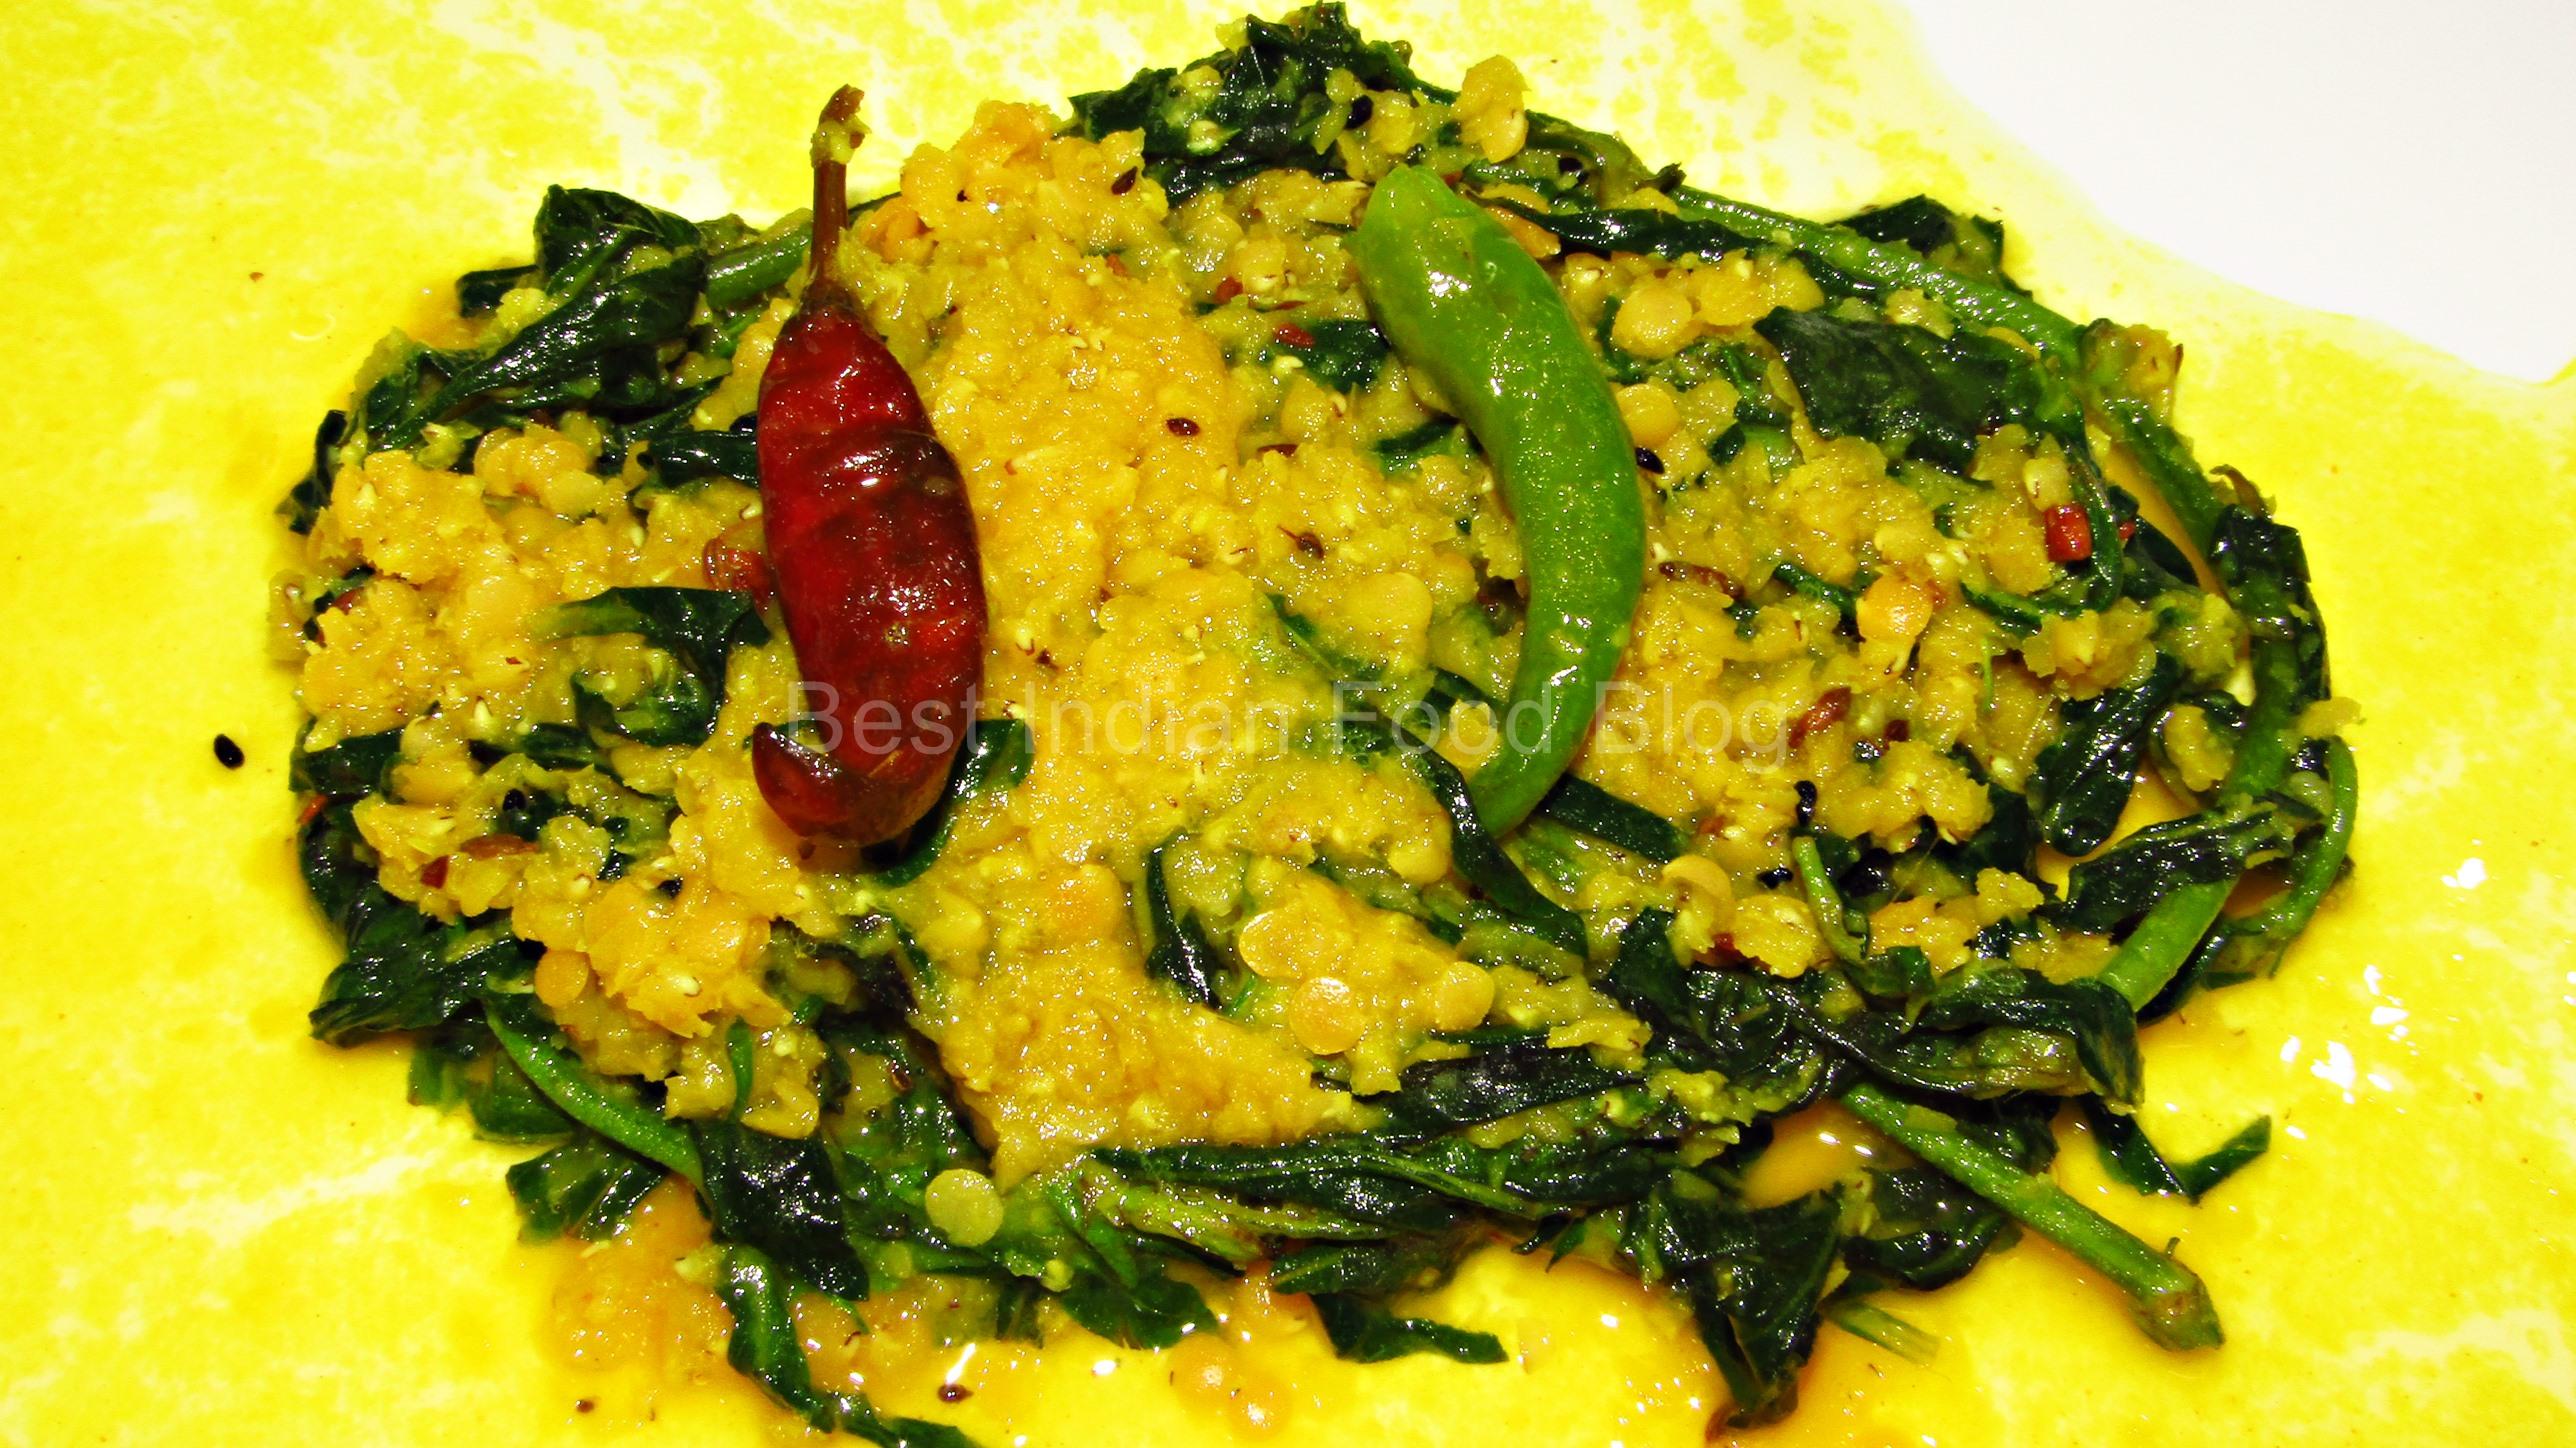 Kulekhara Musuri from West Bengal, India   Best Indian Food Blog   Indian Swampweed Lentils recipe